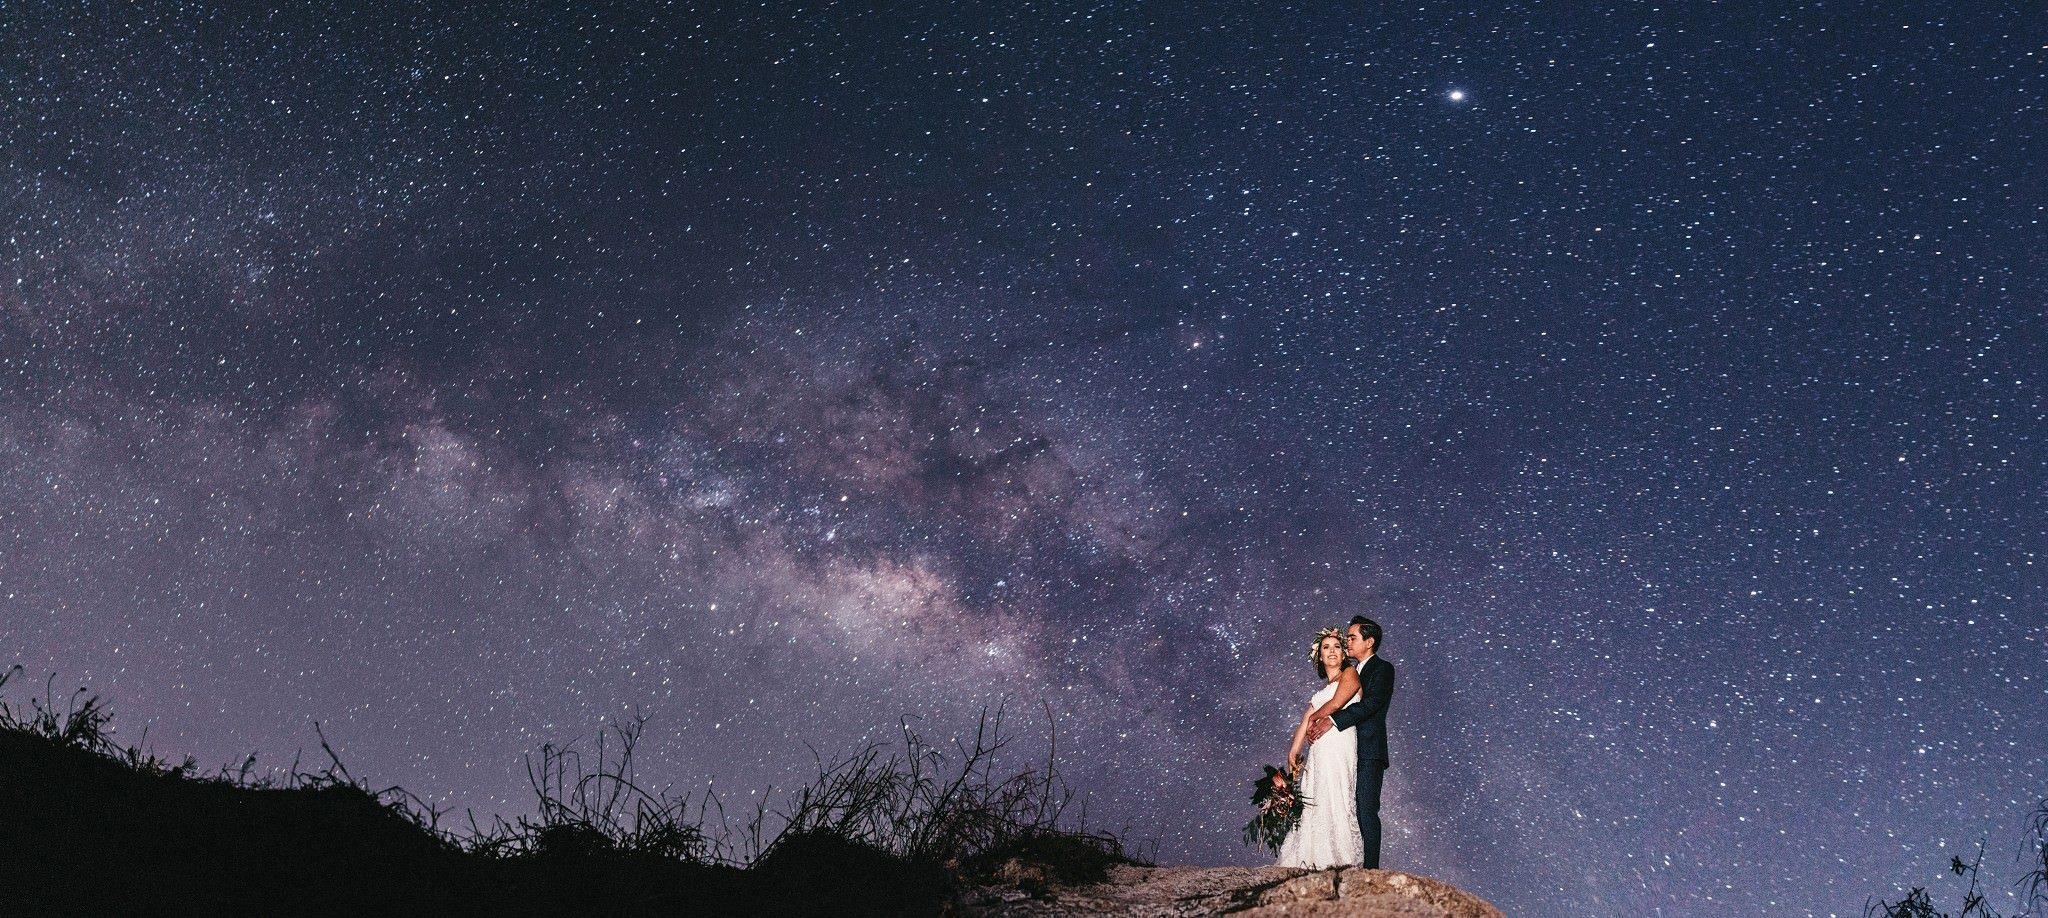 astro fotografía vallarta